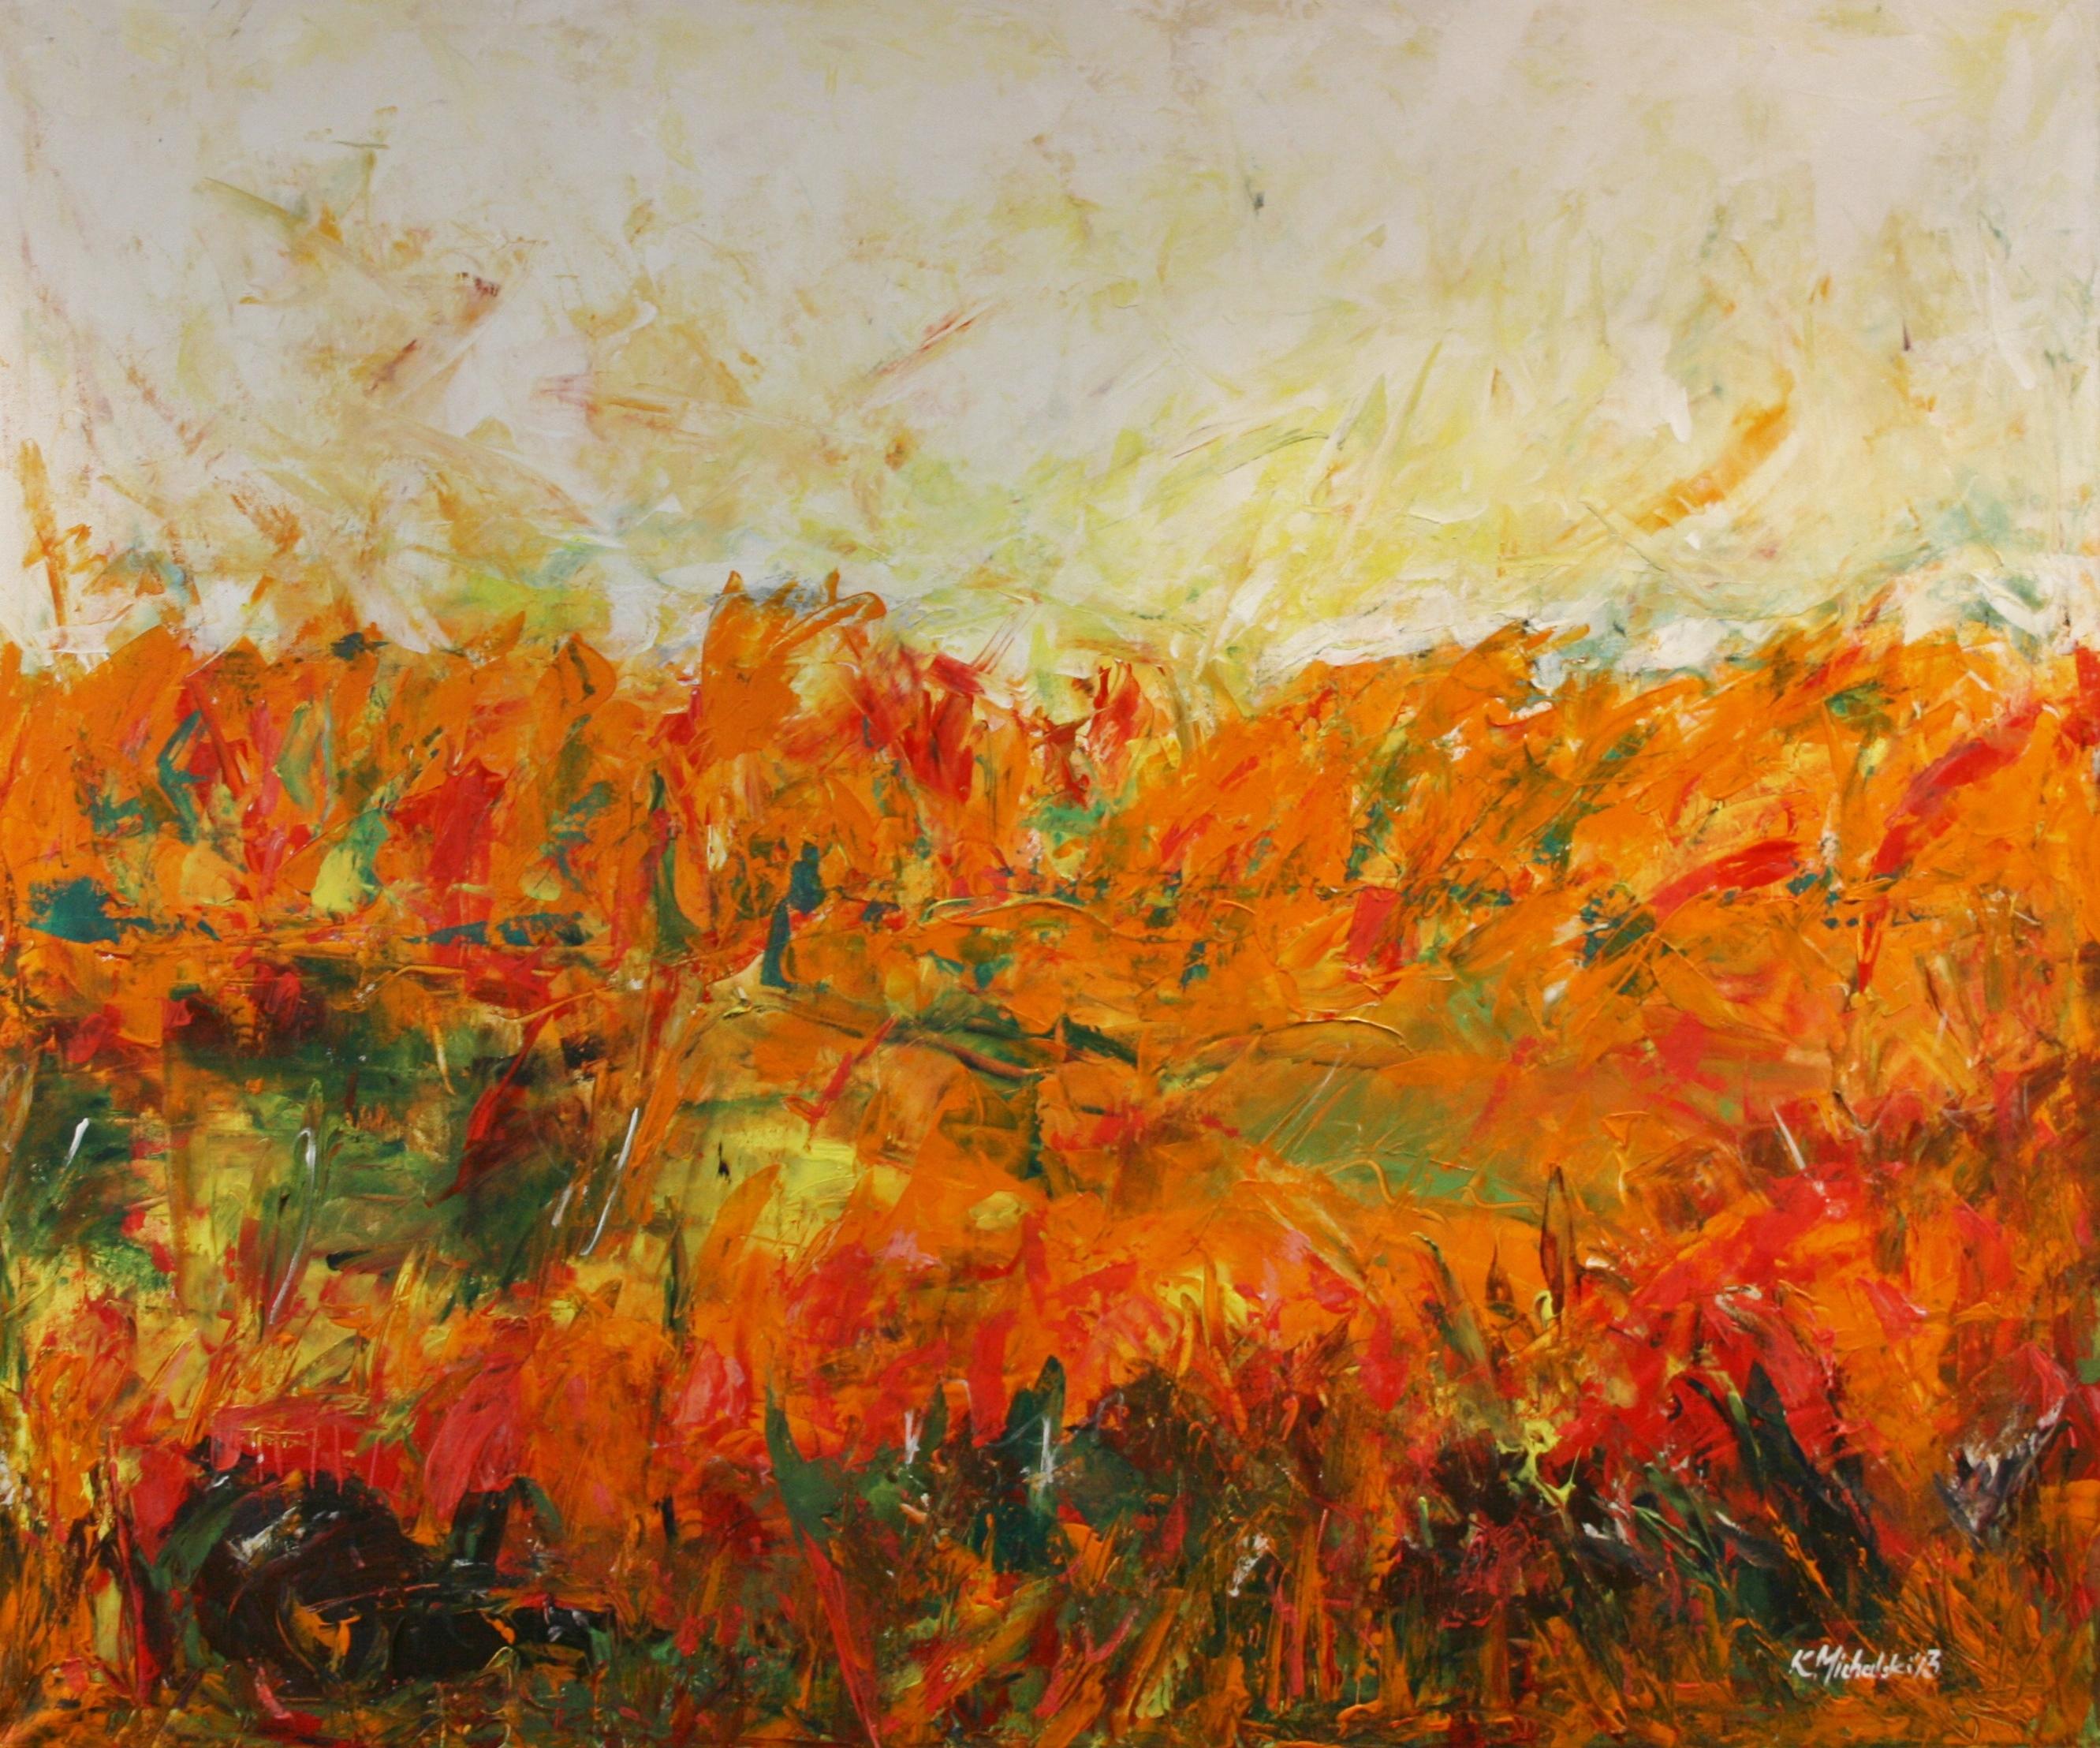 Herbst orange, 2013, 100 x 120, Acryl auf Leinwand